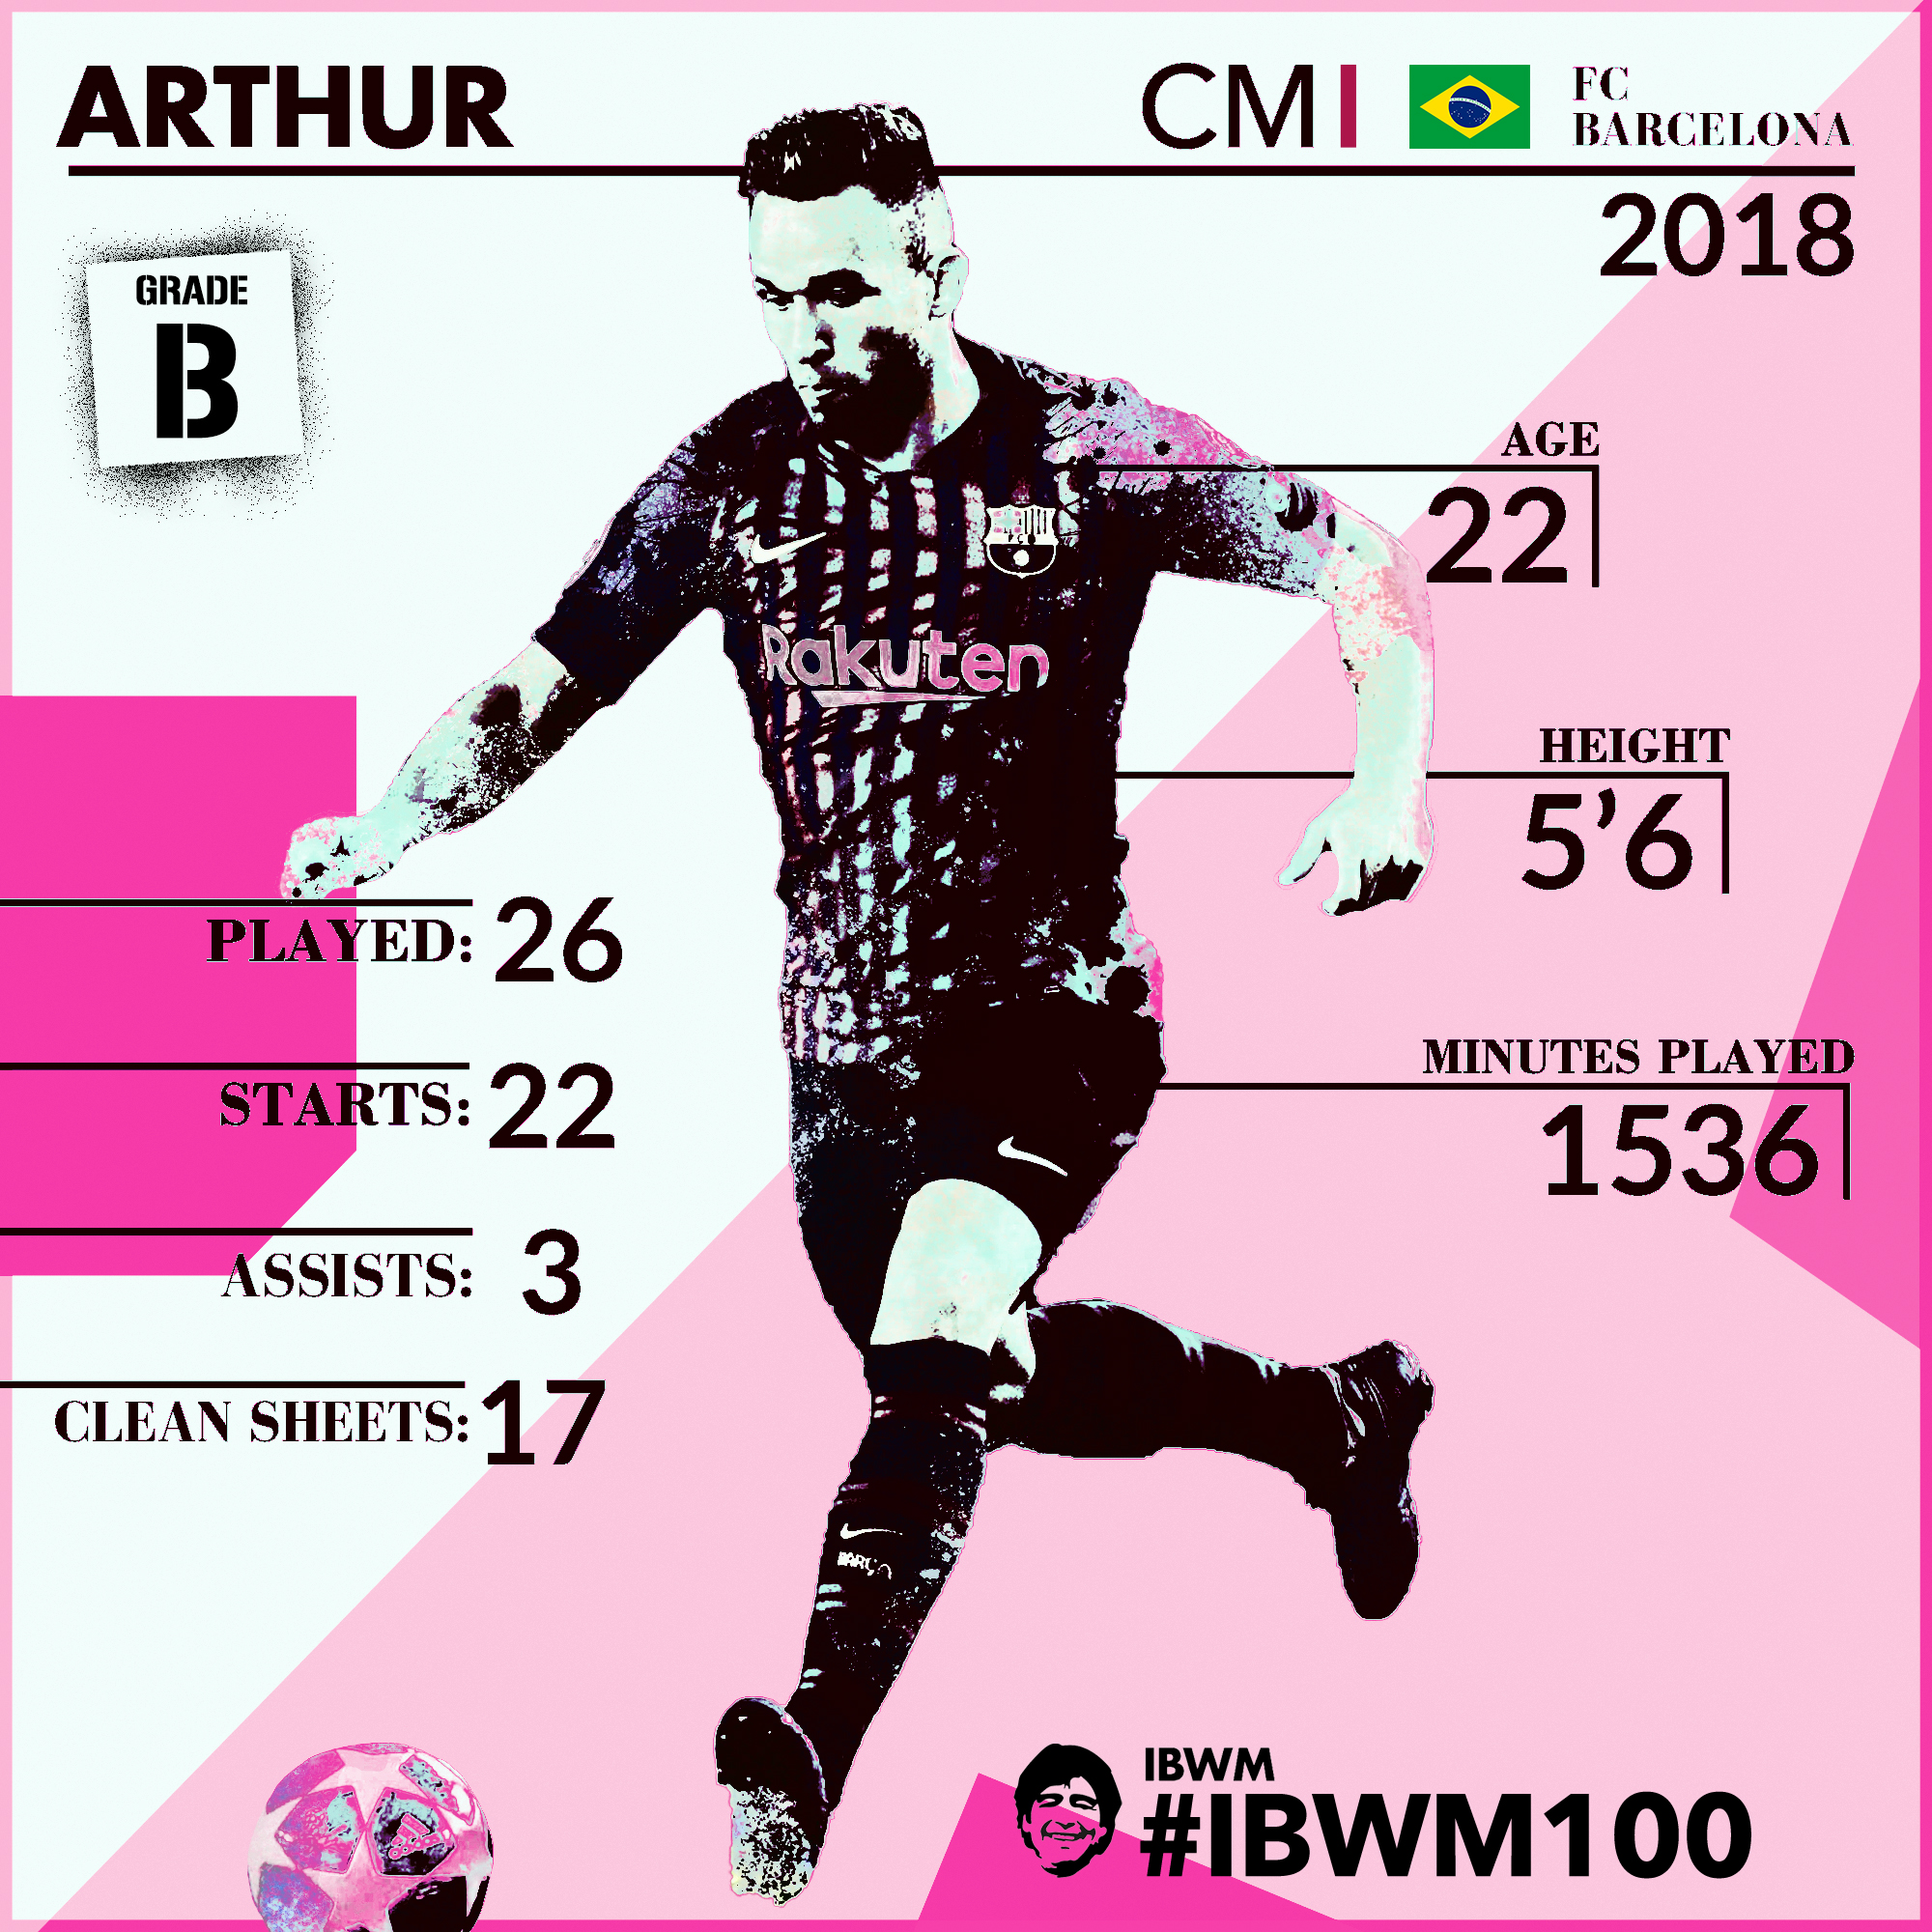 IBWM - Arthur.jpg